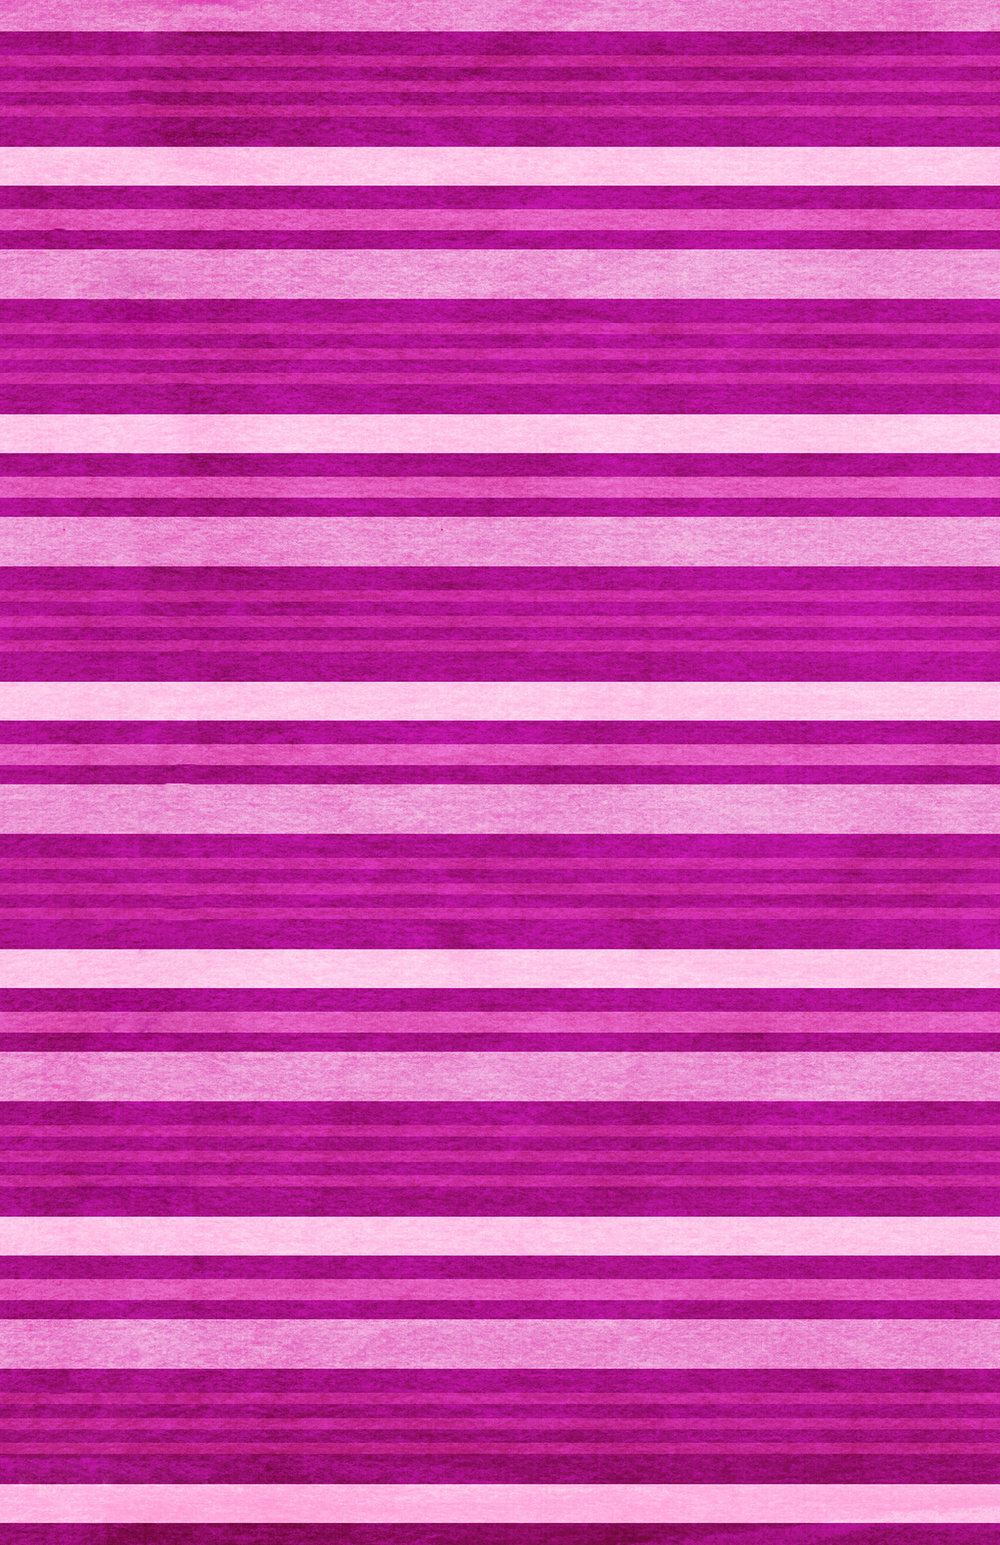 pink stripe front.jpg